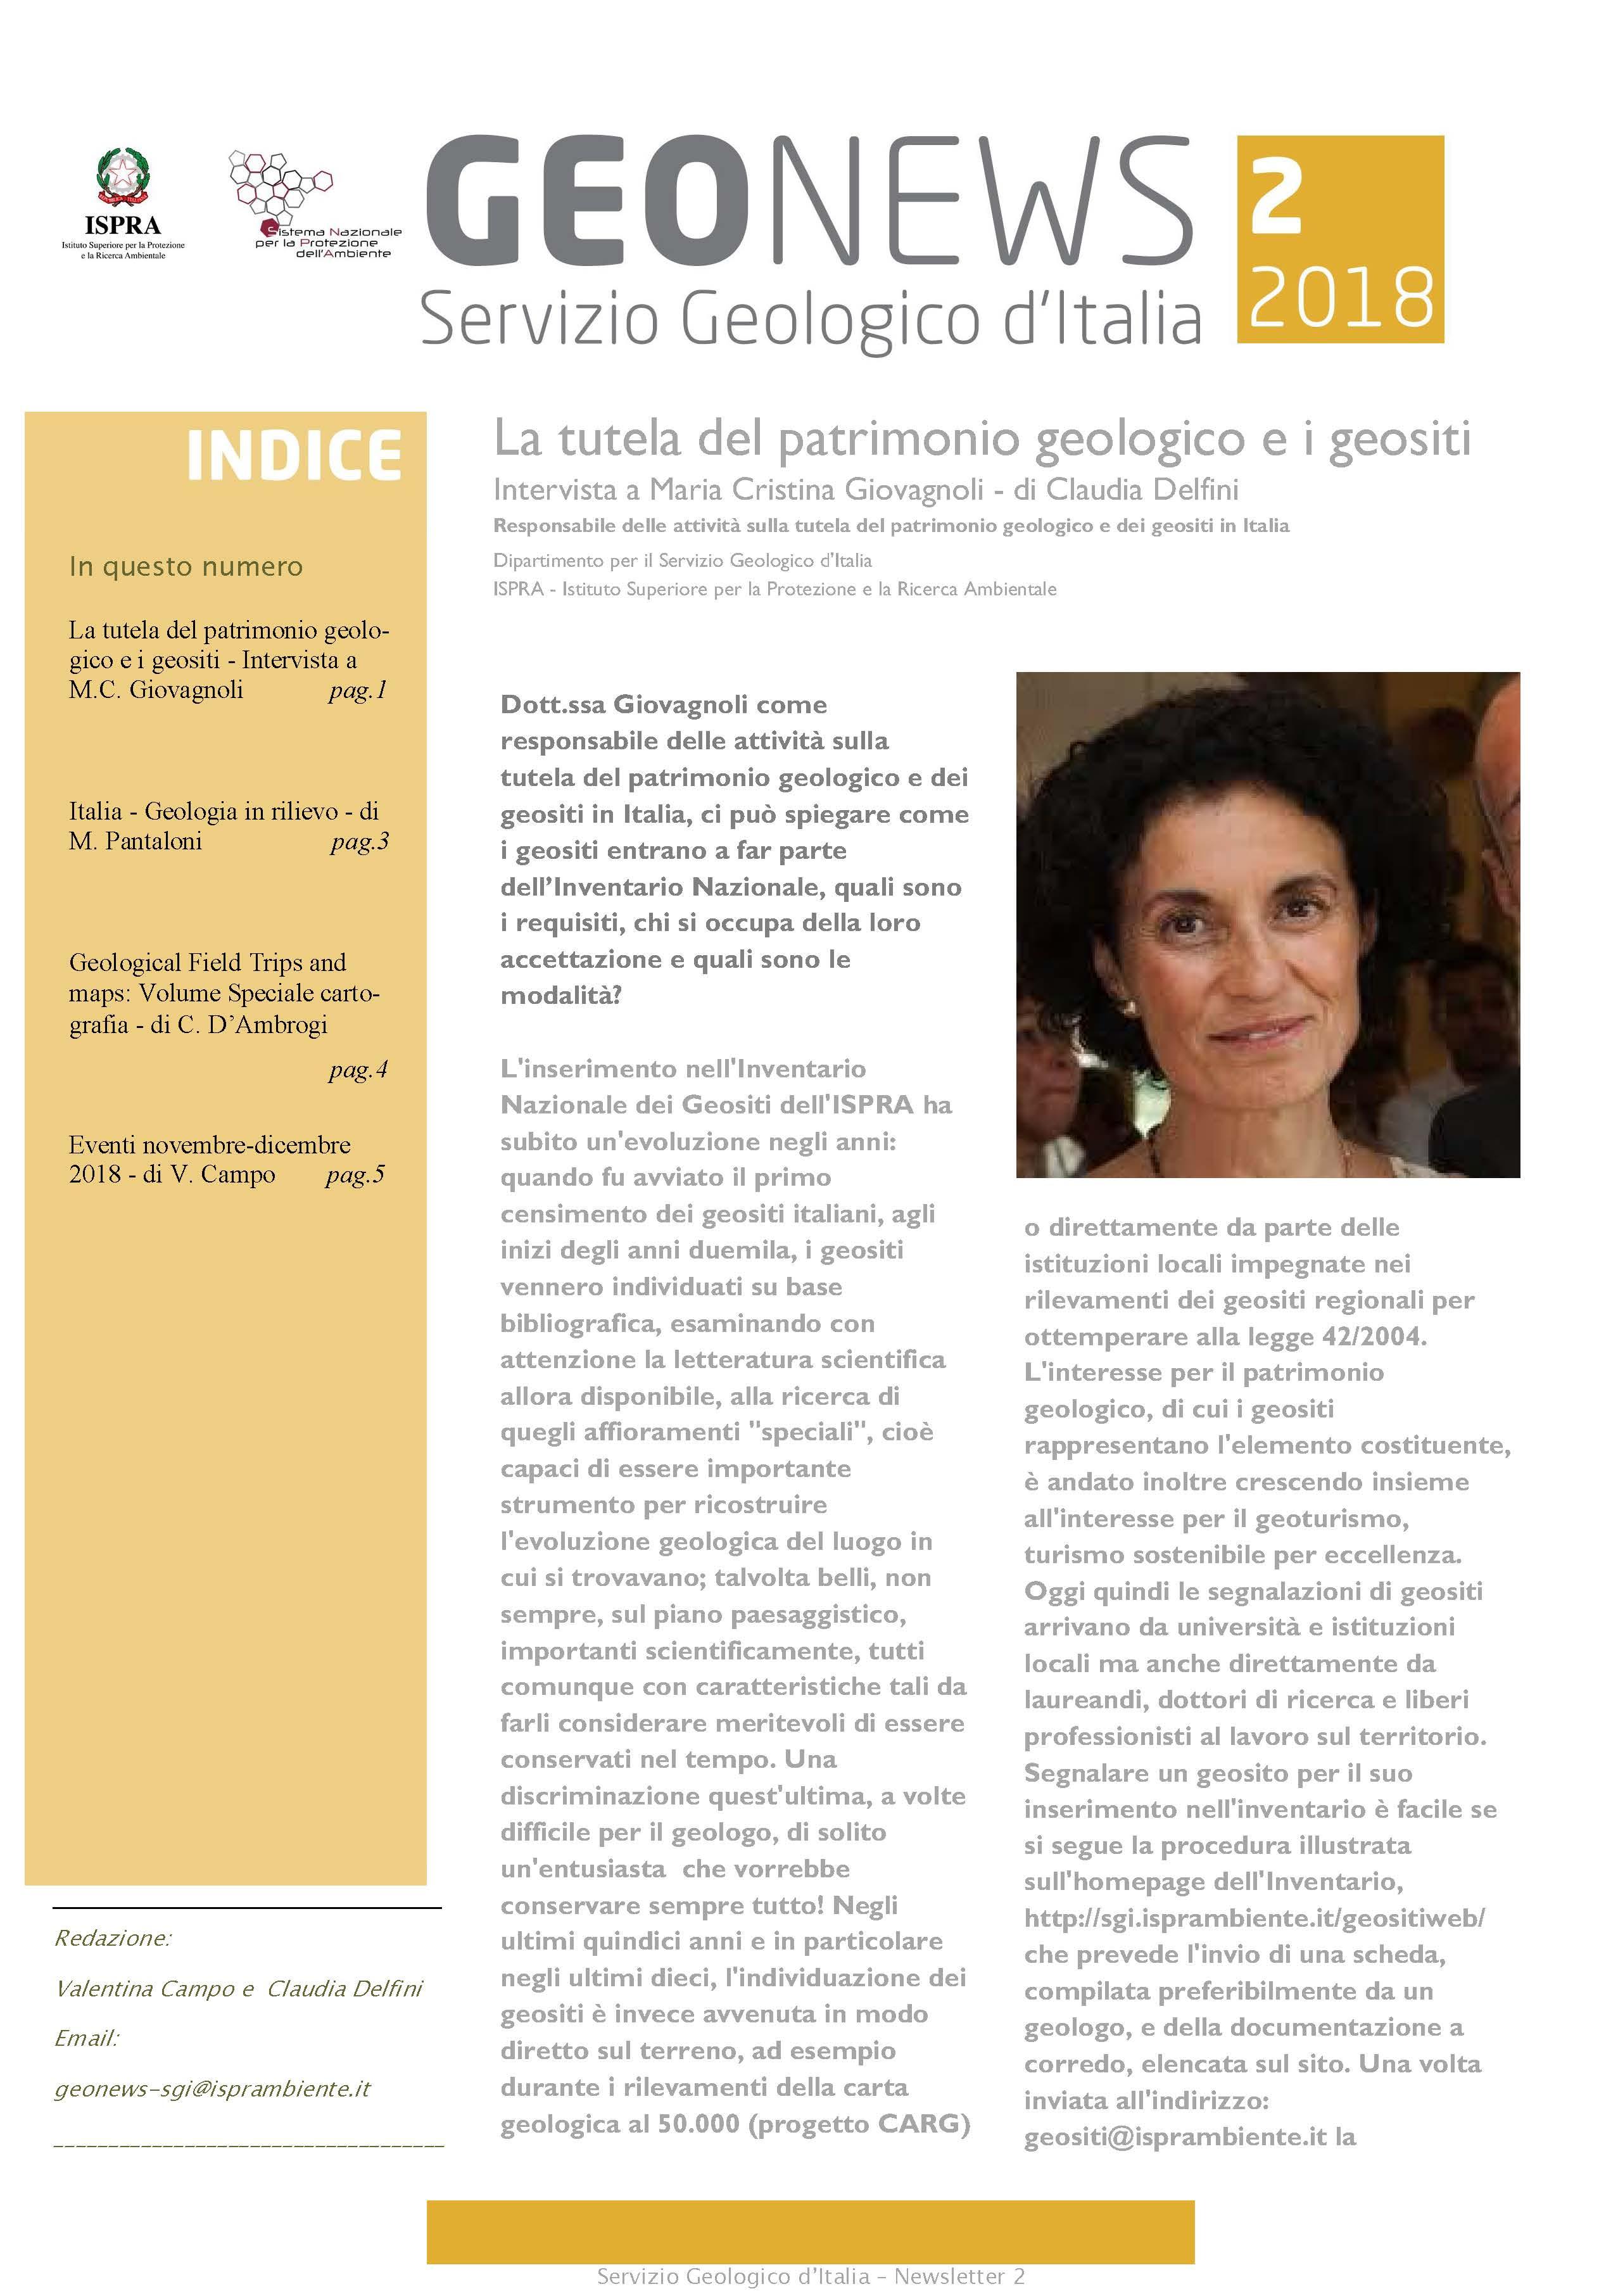 Geonews_2_Pagina_1.jpg